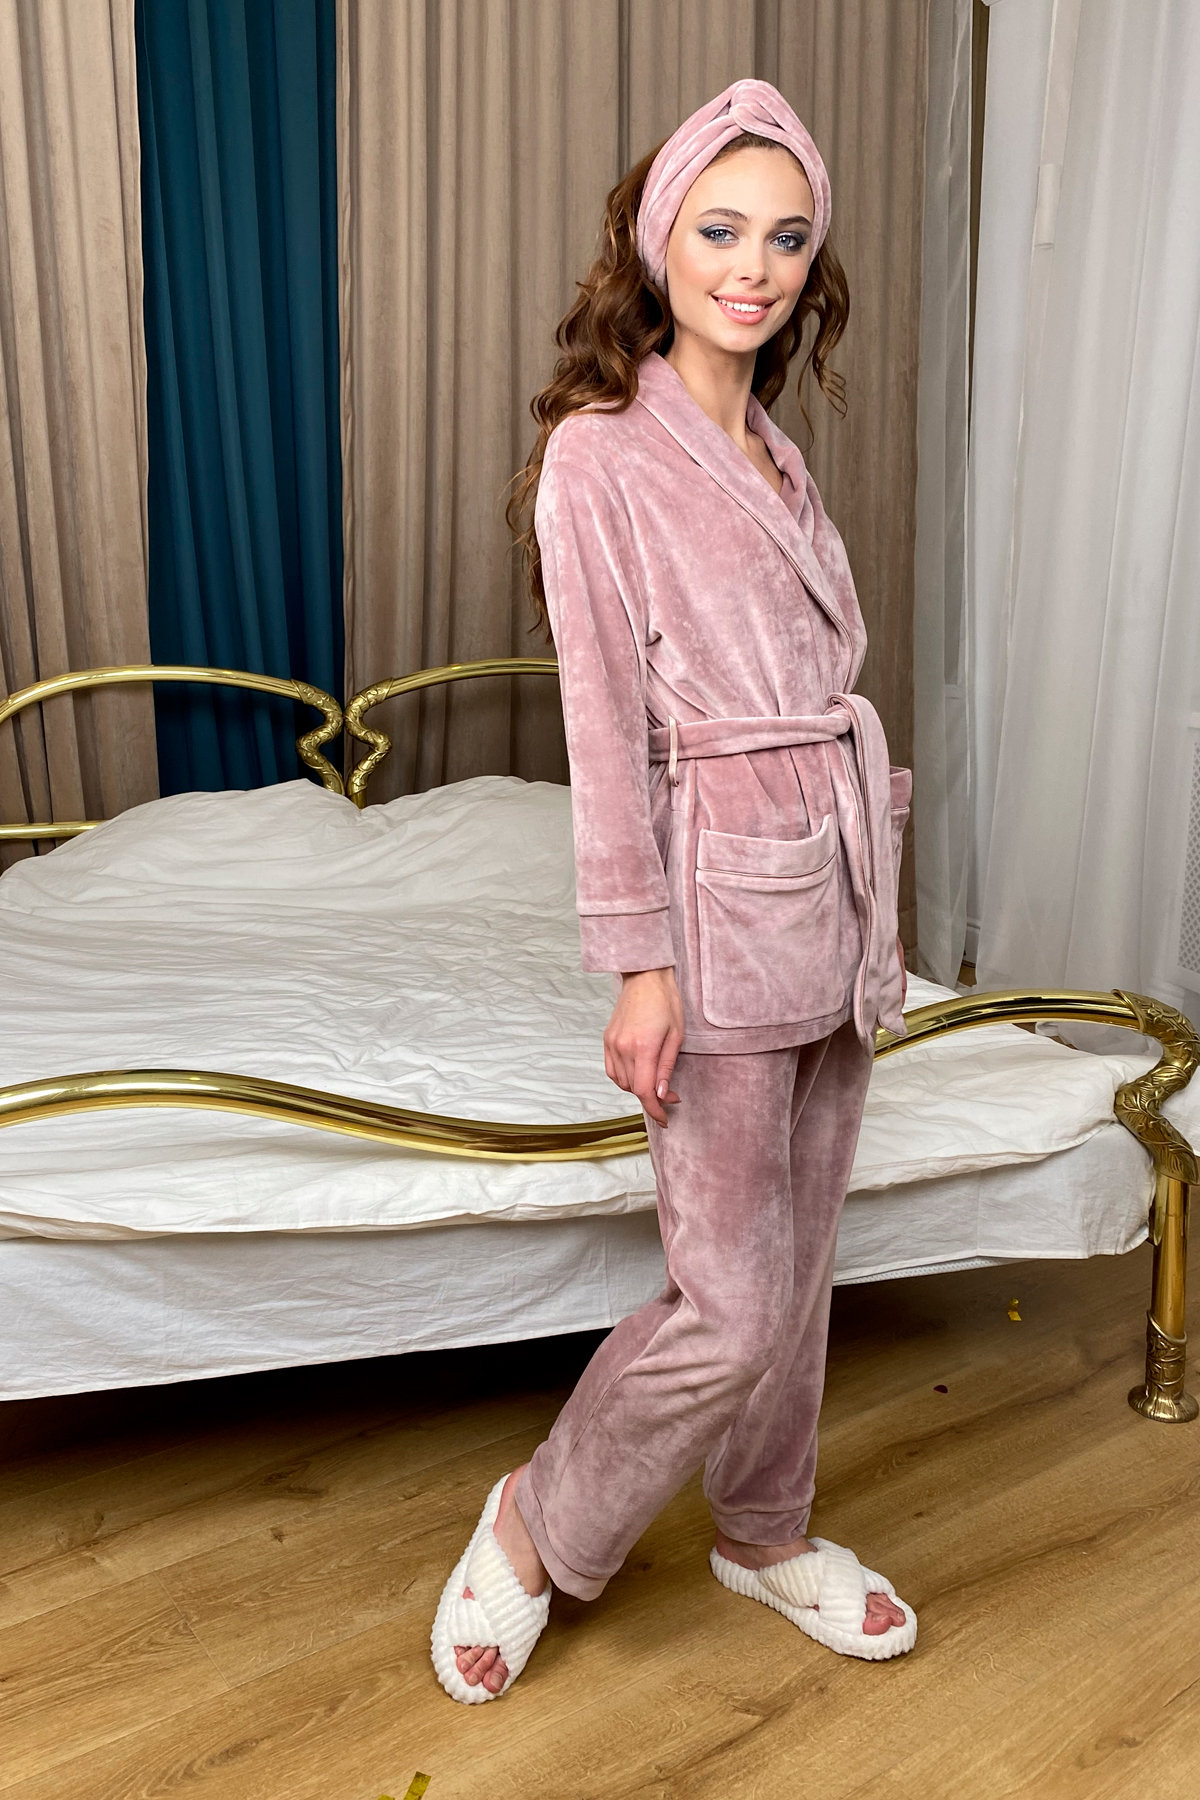 Ясмин пижама из велюра жакет,брюки и маска для сна  10376 АРТ. 46684 Цвет: Пудра - фото 1, интернет магазин tm-modus.ru